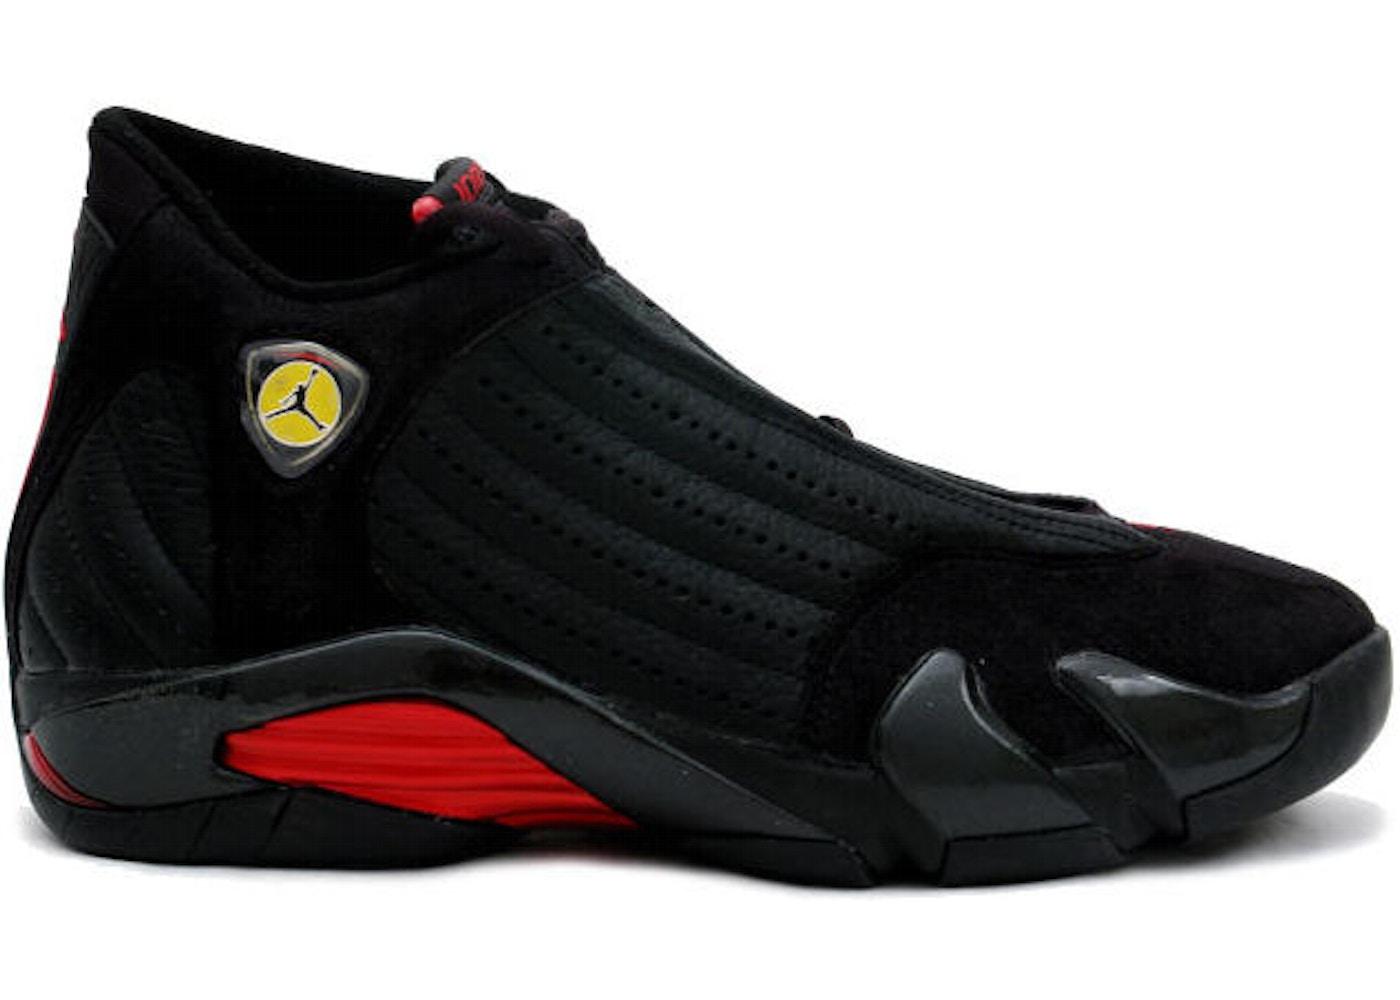 size 40 d7524 6c90c Jordan 14 OG Last Shot (1999)